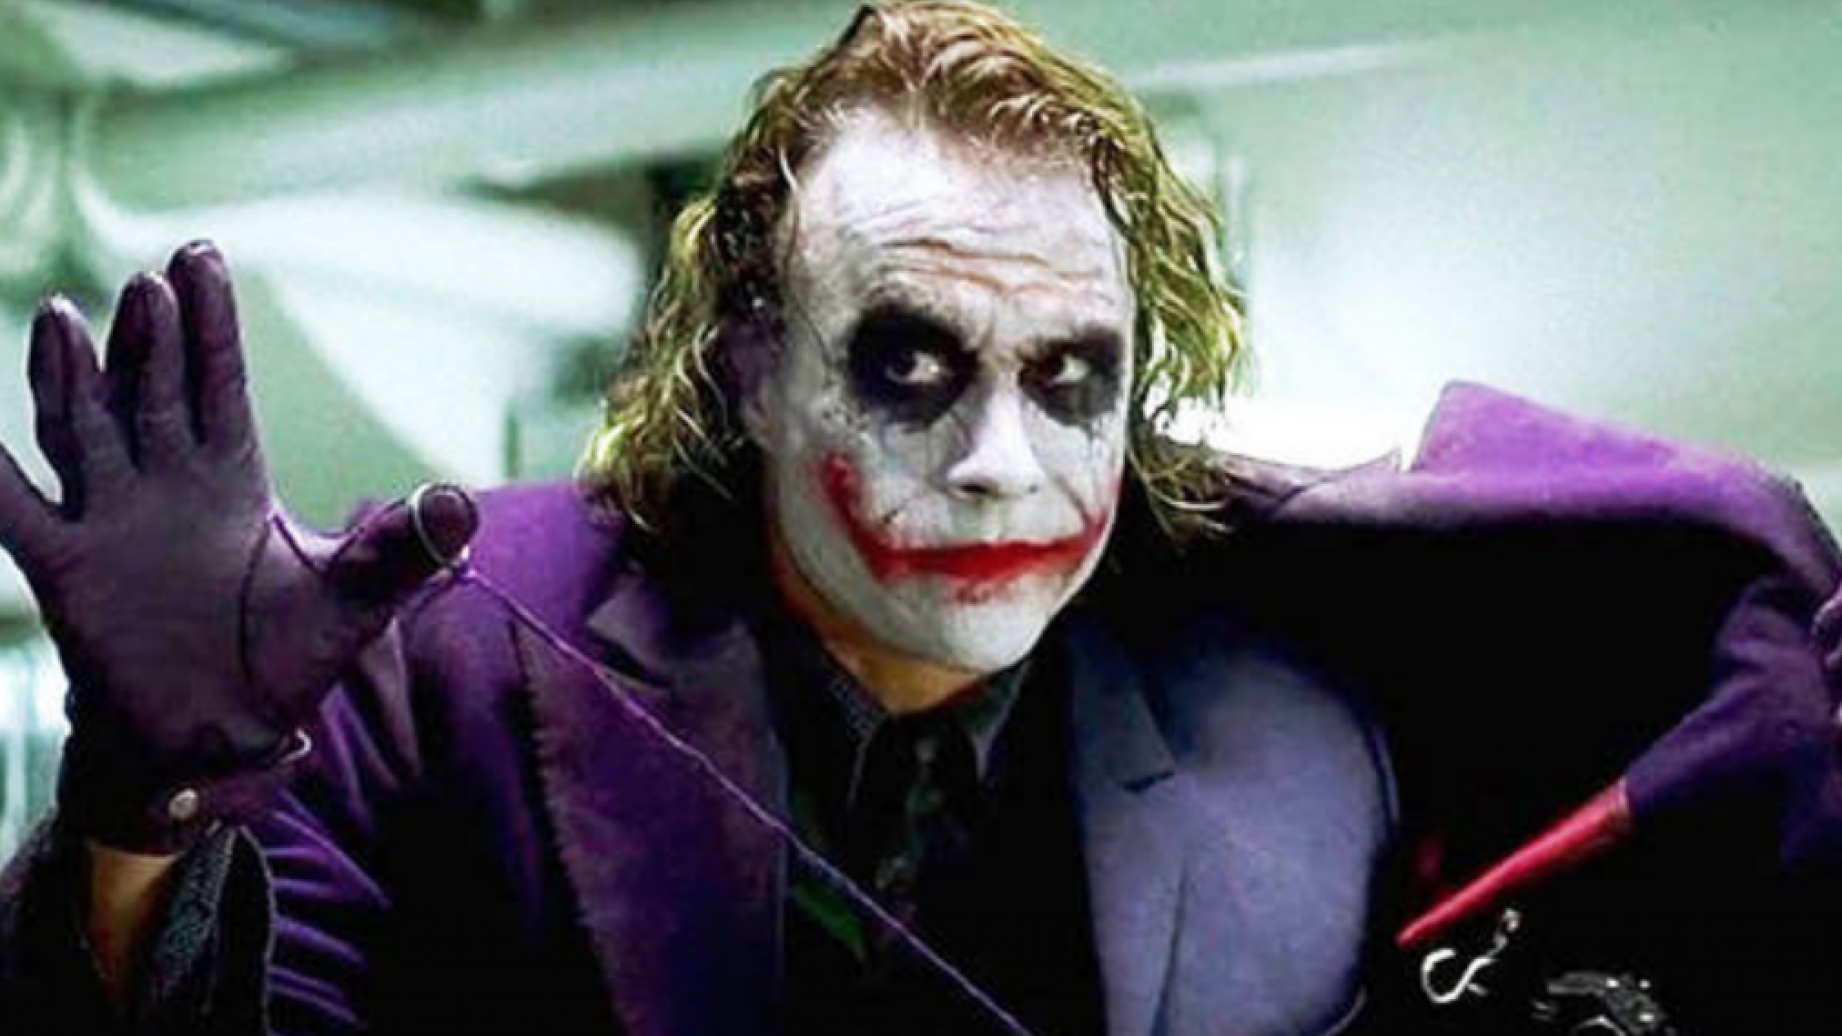 Heath Ledger as The Joker in The Dark Knight. Credit: Warner Bros.